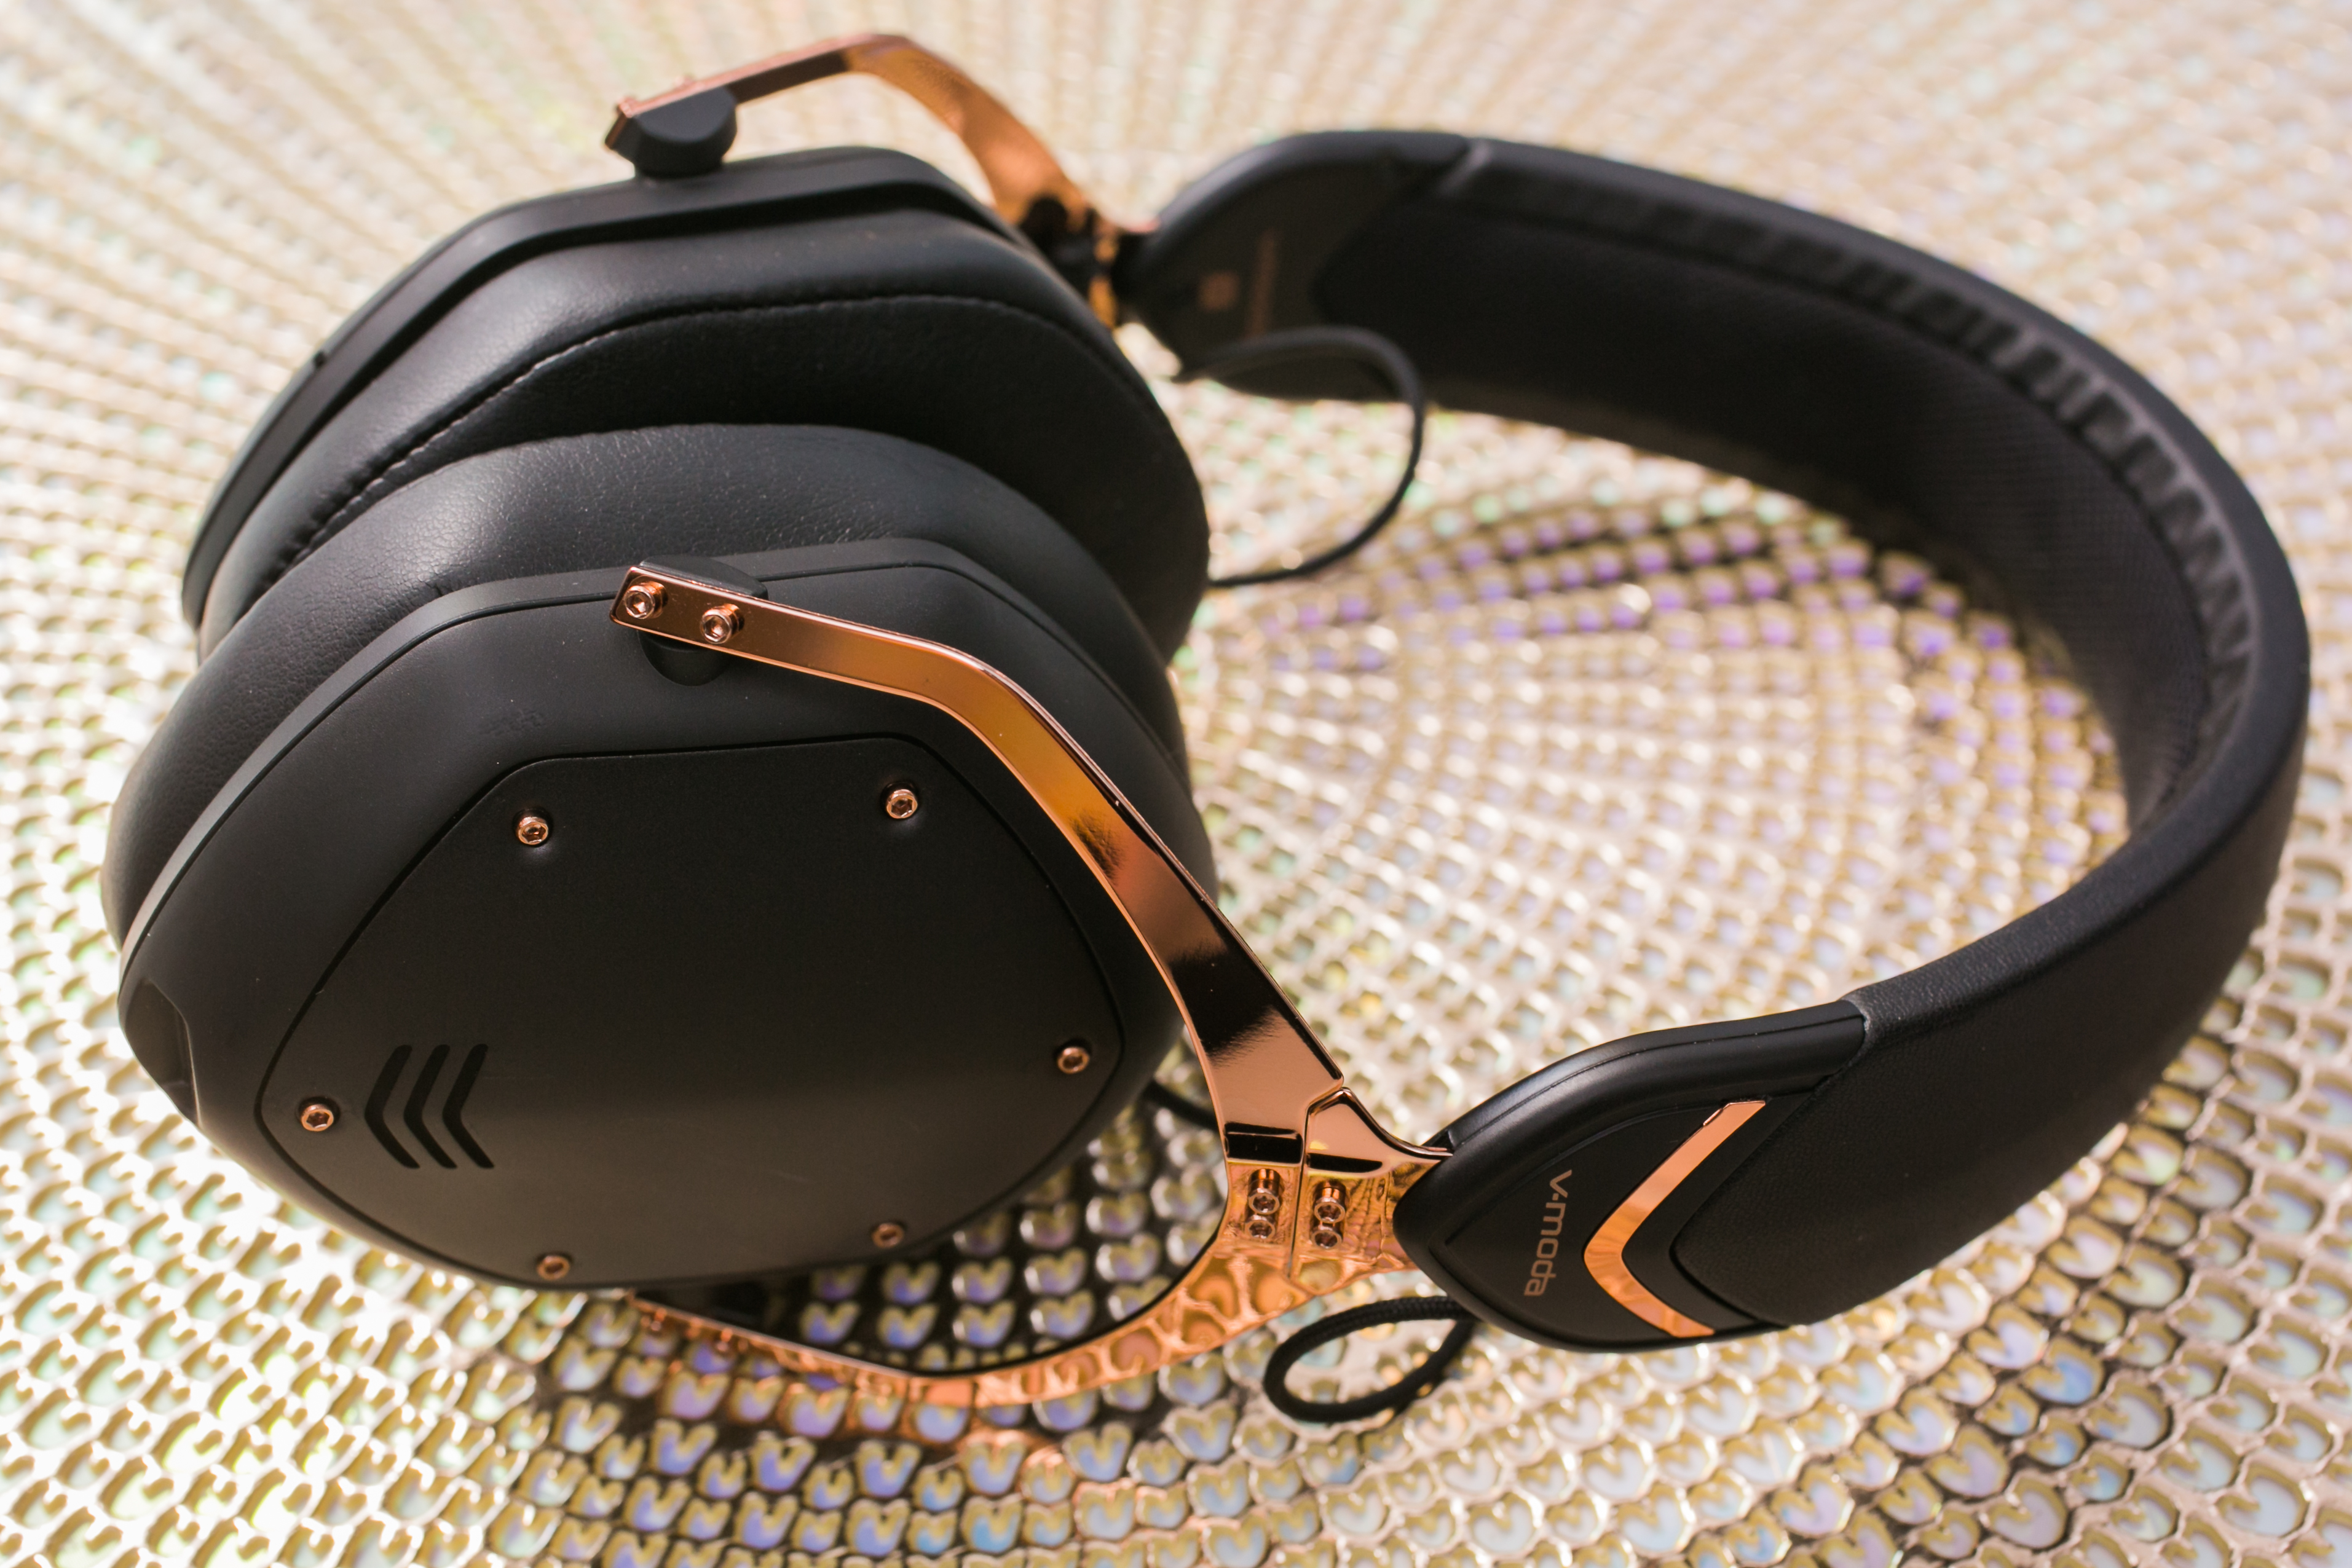 v-moda-crossfade-wireless-2-headphones-08.jpg